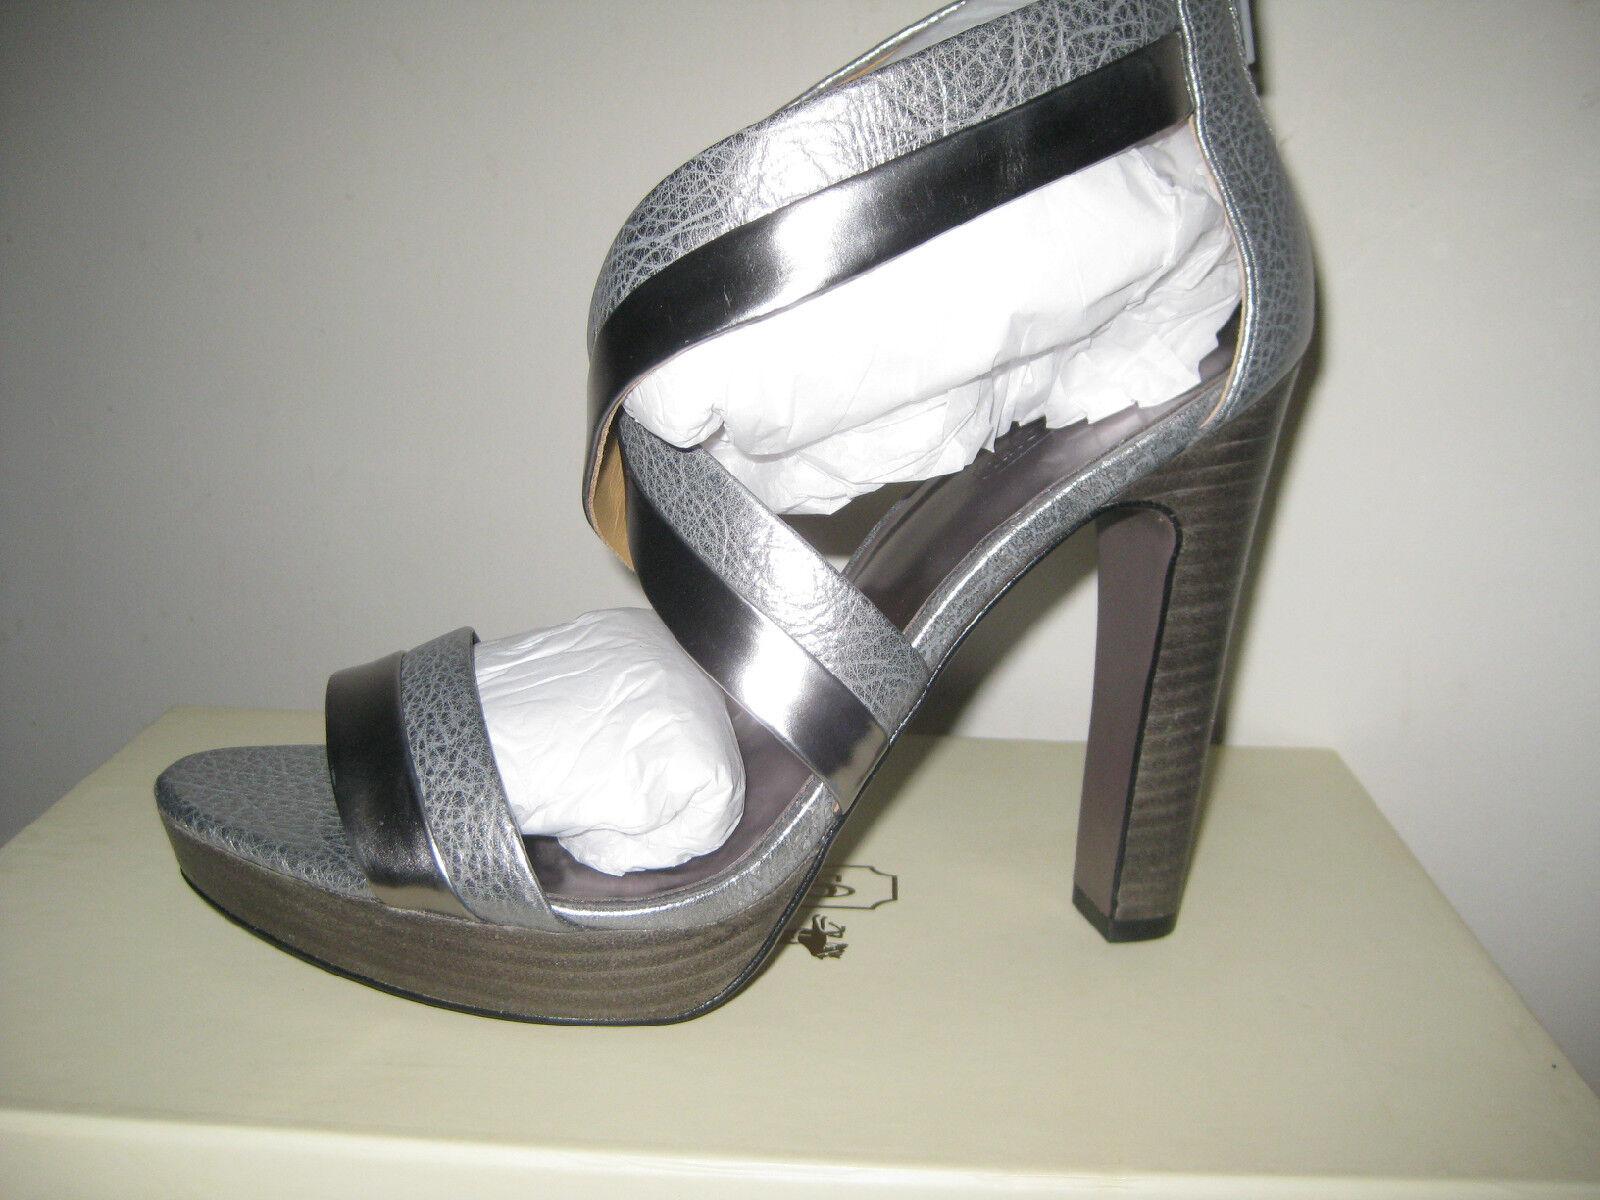 NEW COACH BRYNN CUBA Metallic Pewter Silber schuhe  218 Stacked Sandals 3723